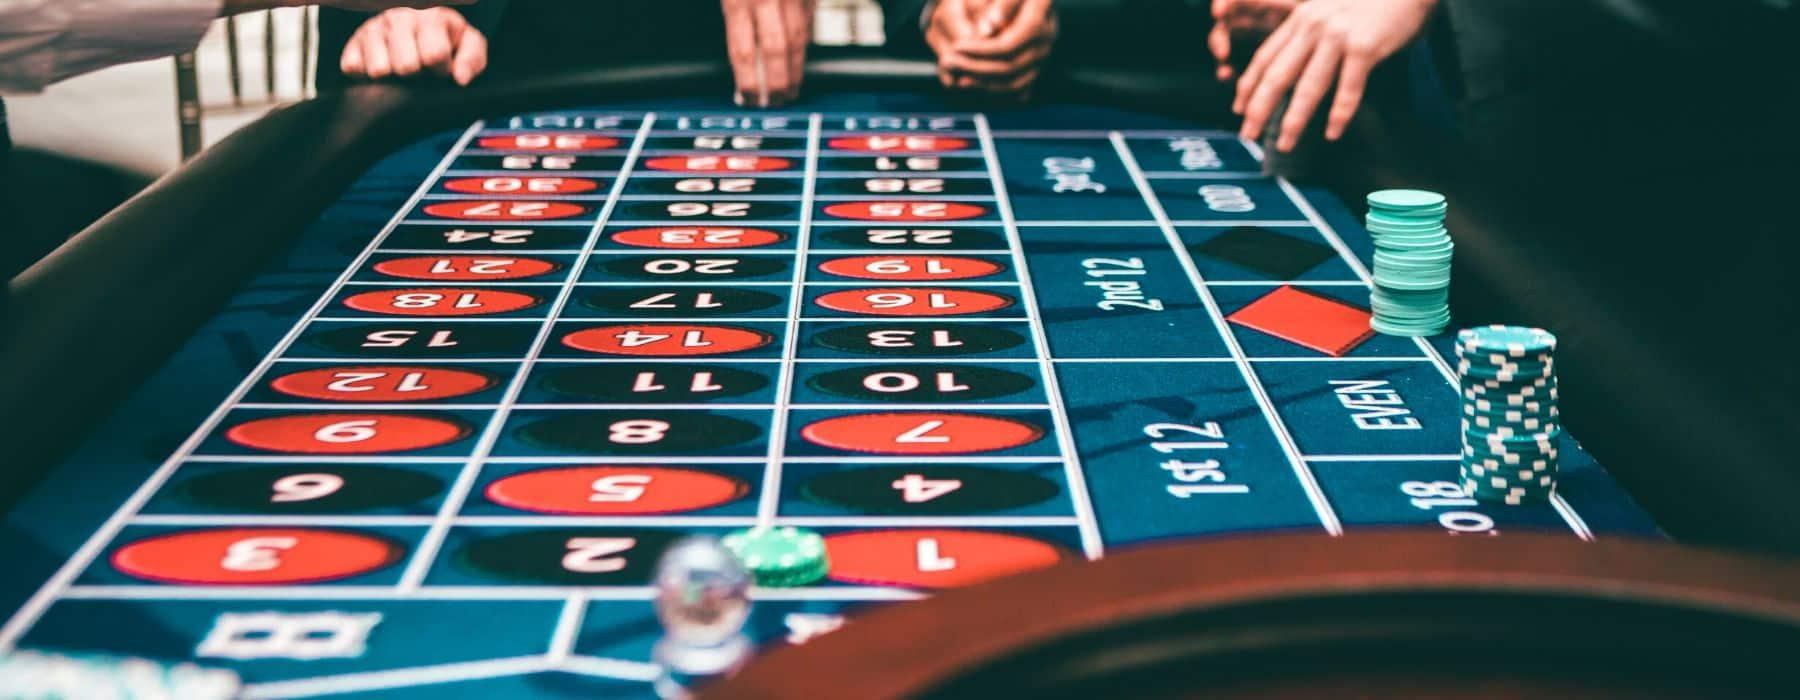 ANIMATION table de casino